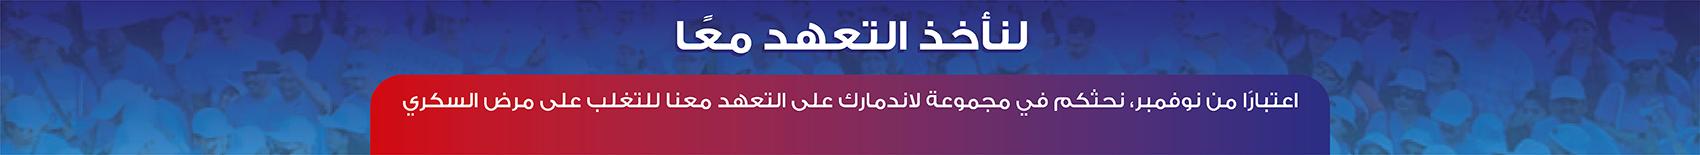 BD_website_pledge